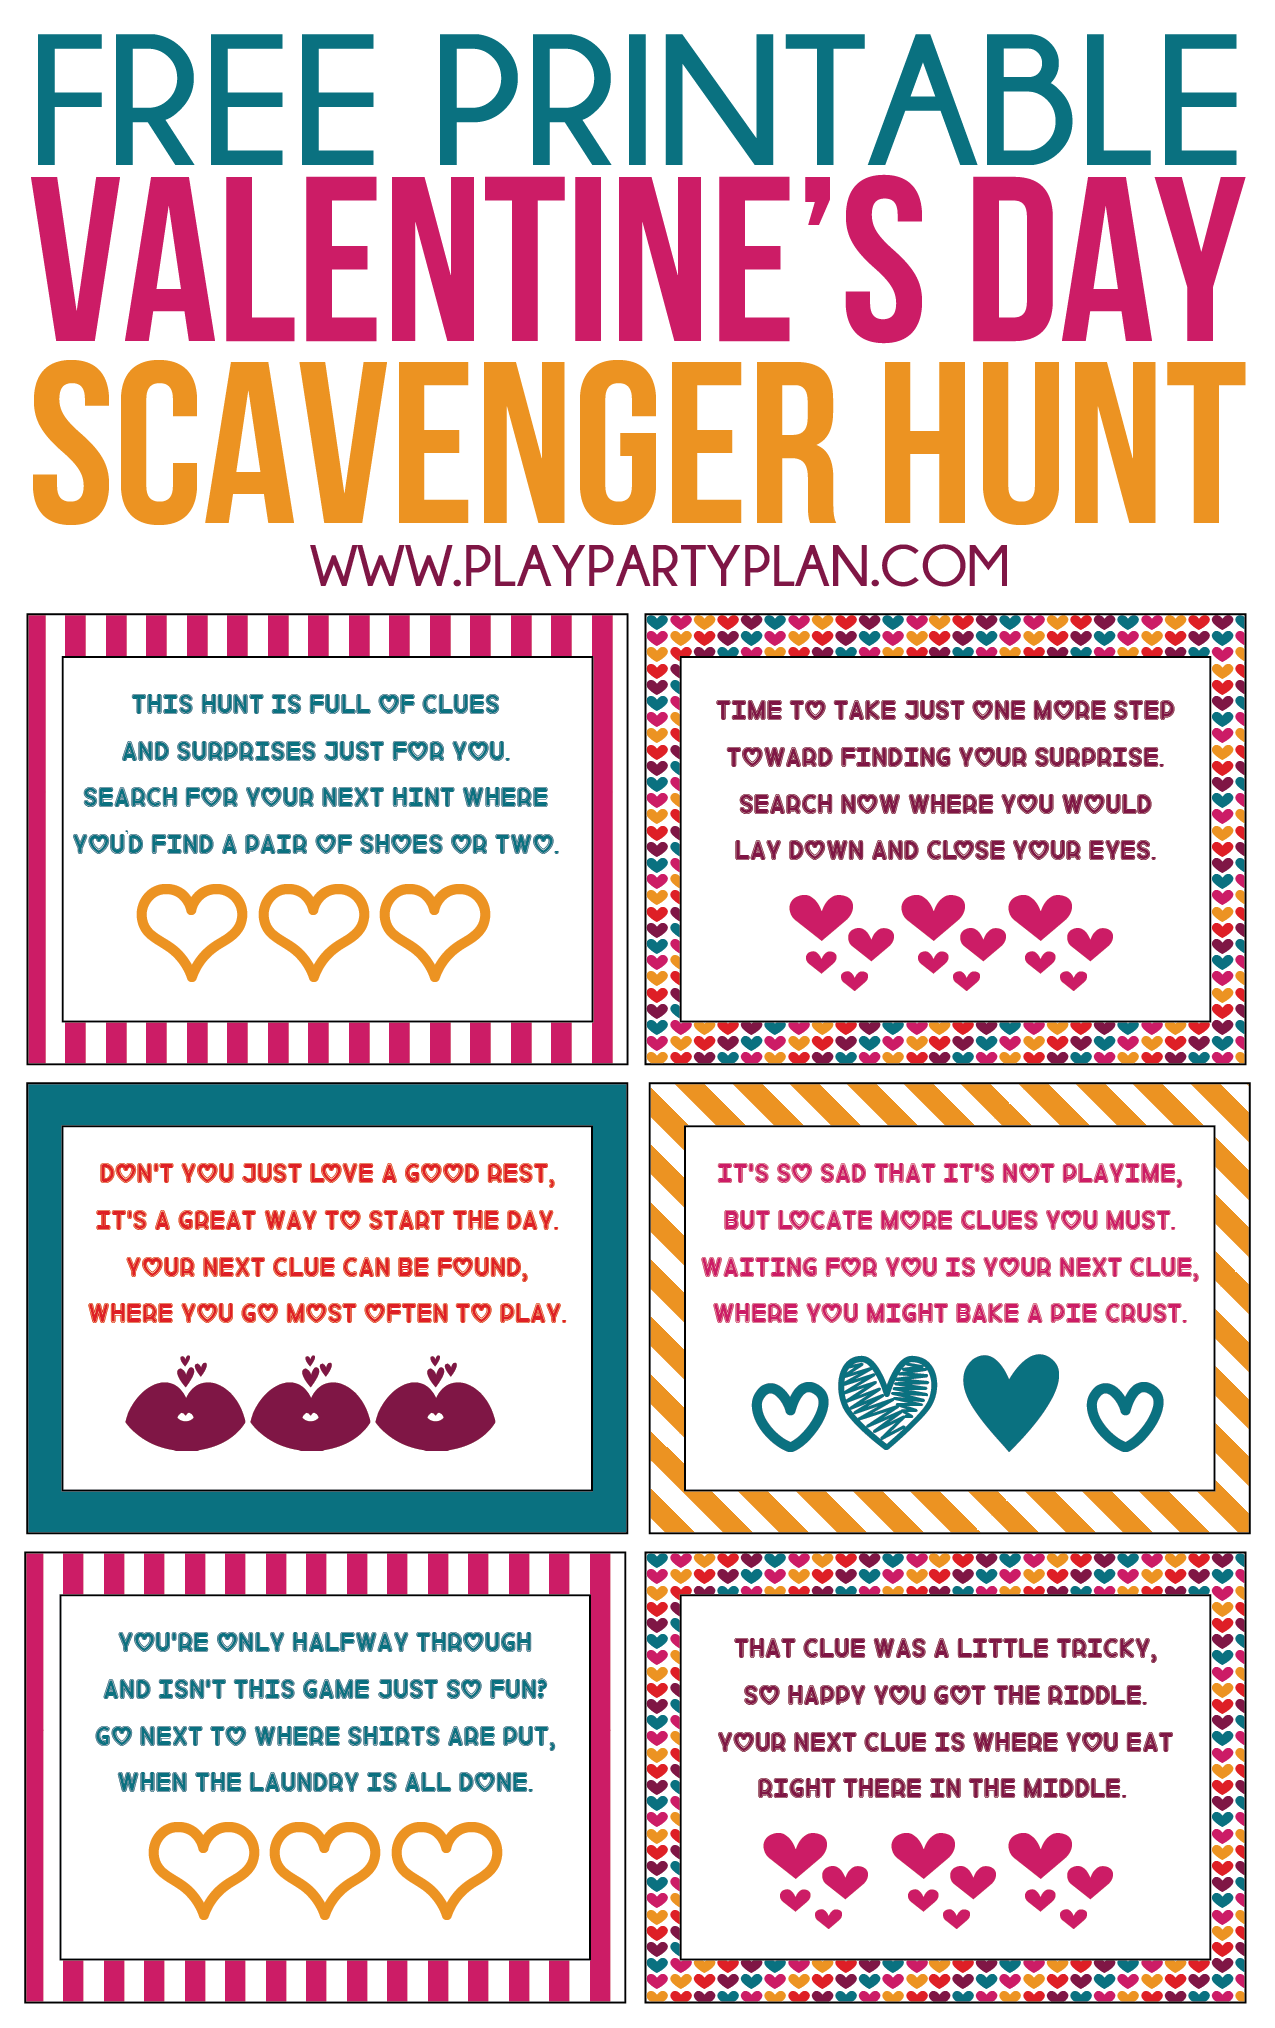 Free Printable Valentine's Day Scavenger Hunt Kids